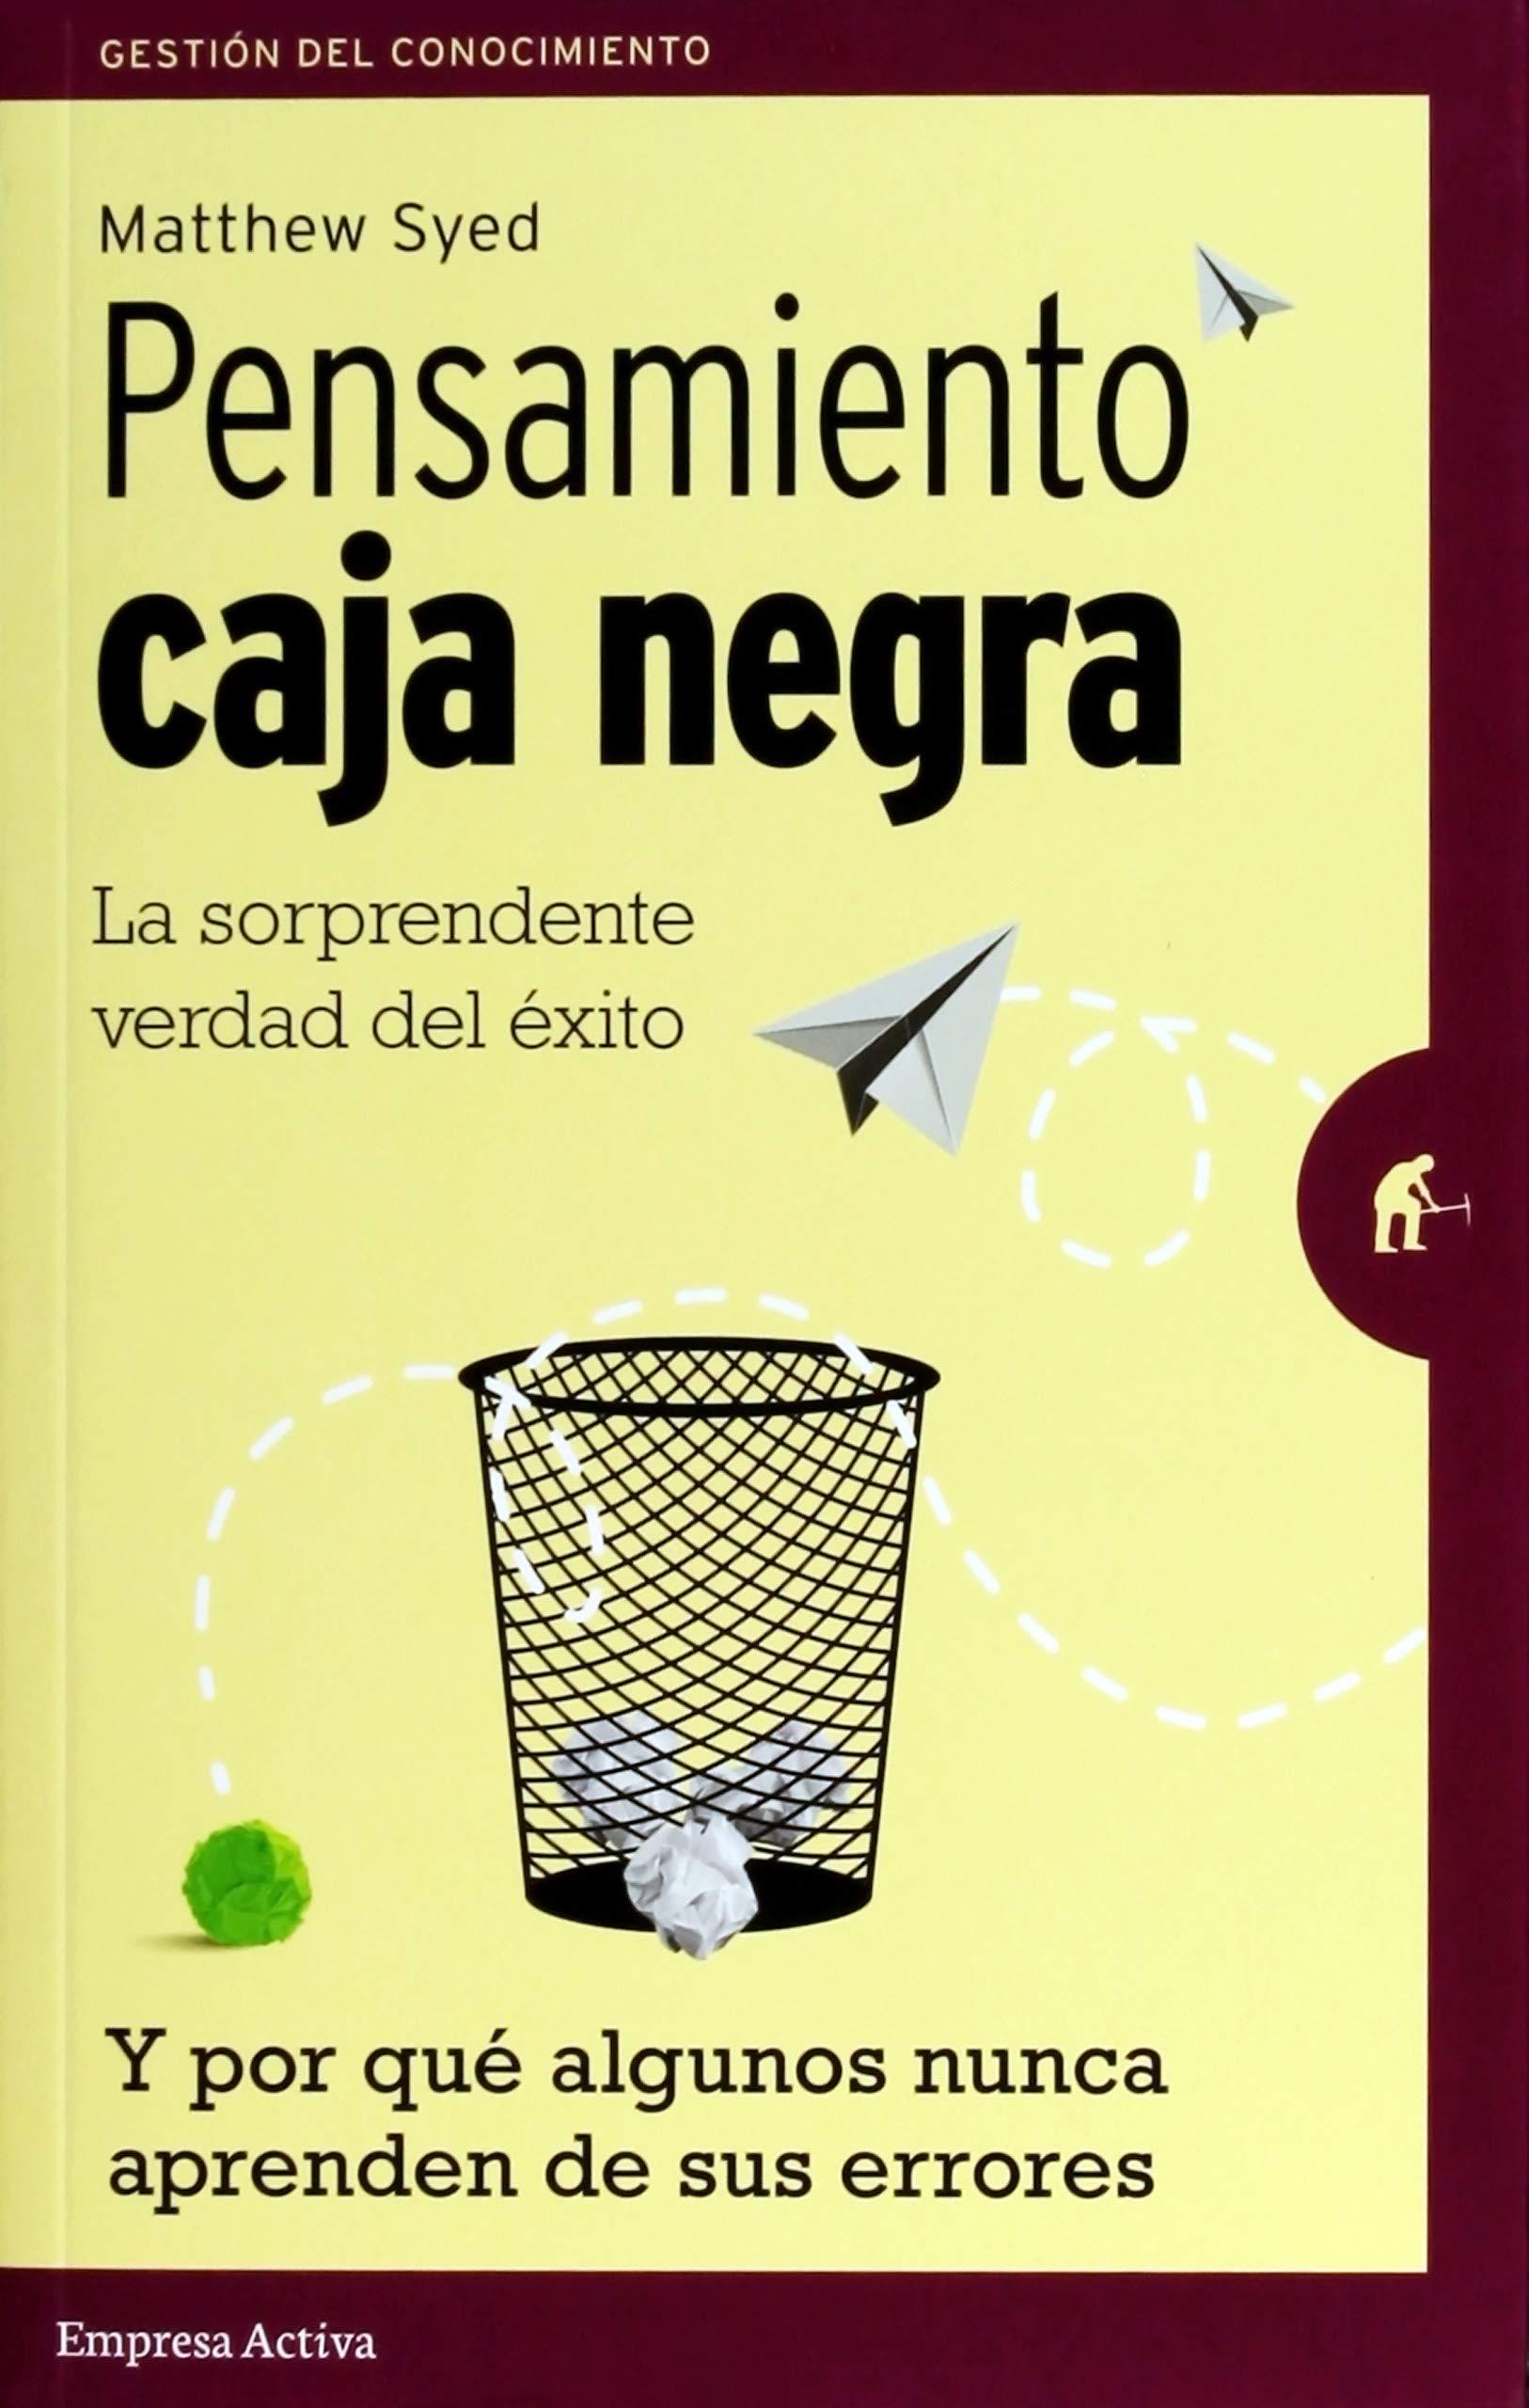 Pensamiento caja negra (Spanish Edition): Matthew Syed: 9788492921461: Amazon.com: Books